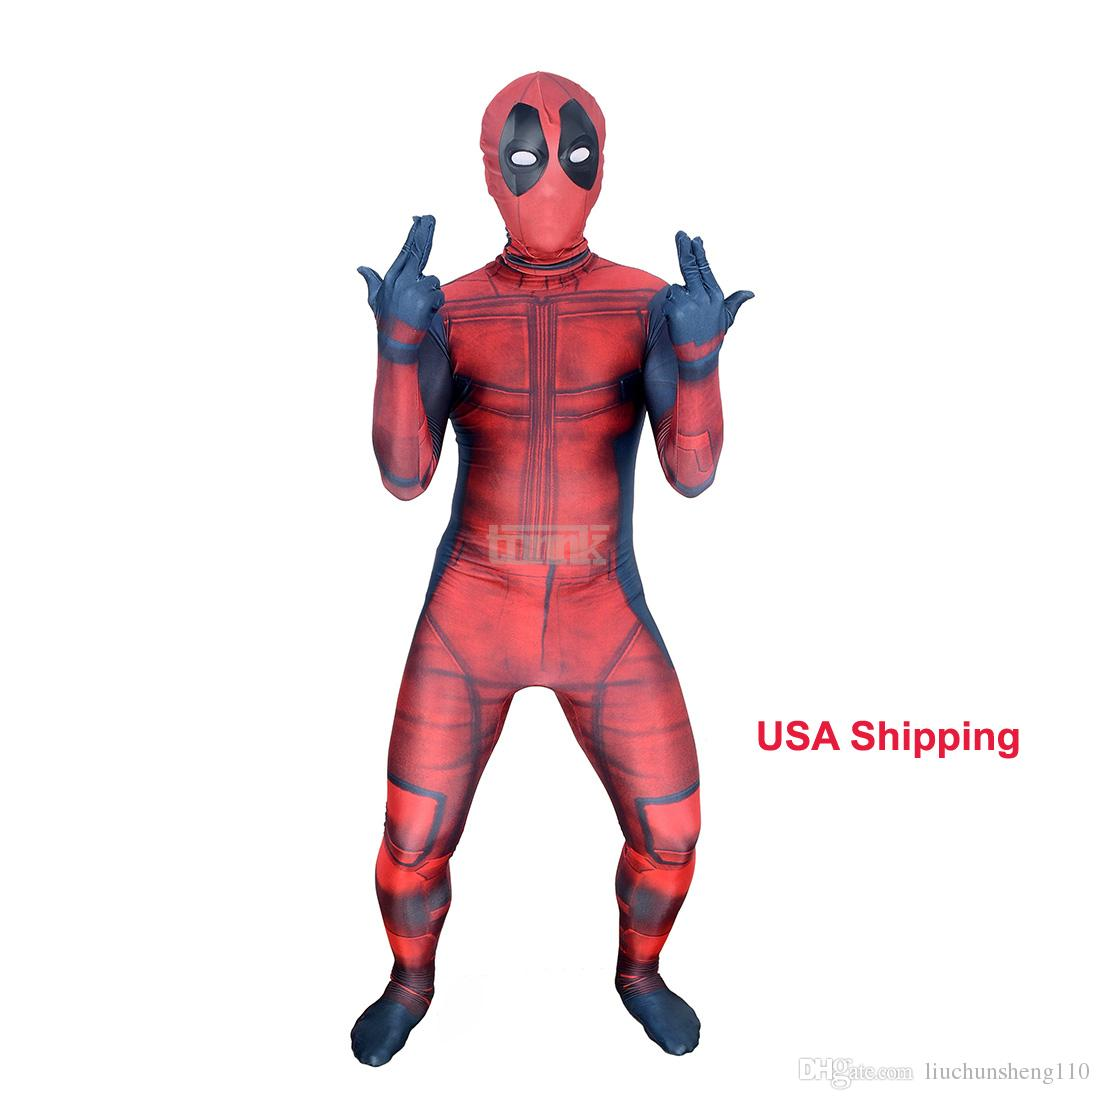 Compre Niños 3D Deadpool 3D X Men Deadpool Halloween Cosplay Superhéroe Lycra  Spandex Zentai Trajes Traje De Deadpool Unisex A  33.66 Del Liuchunsheng110  ... 3fe6c4661ba